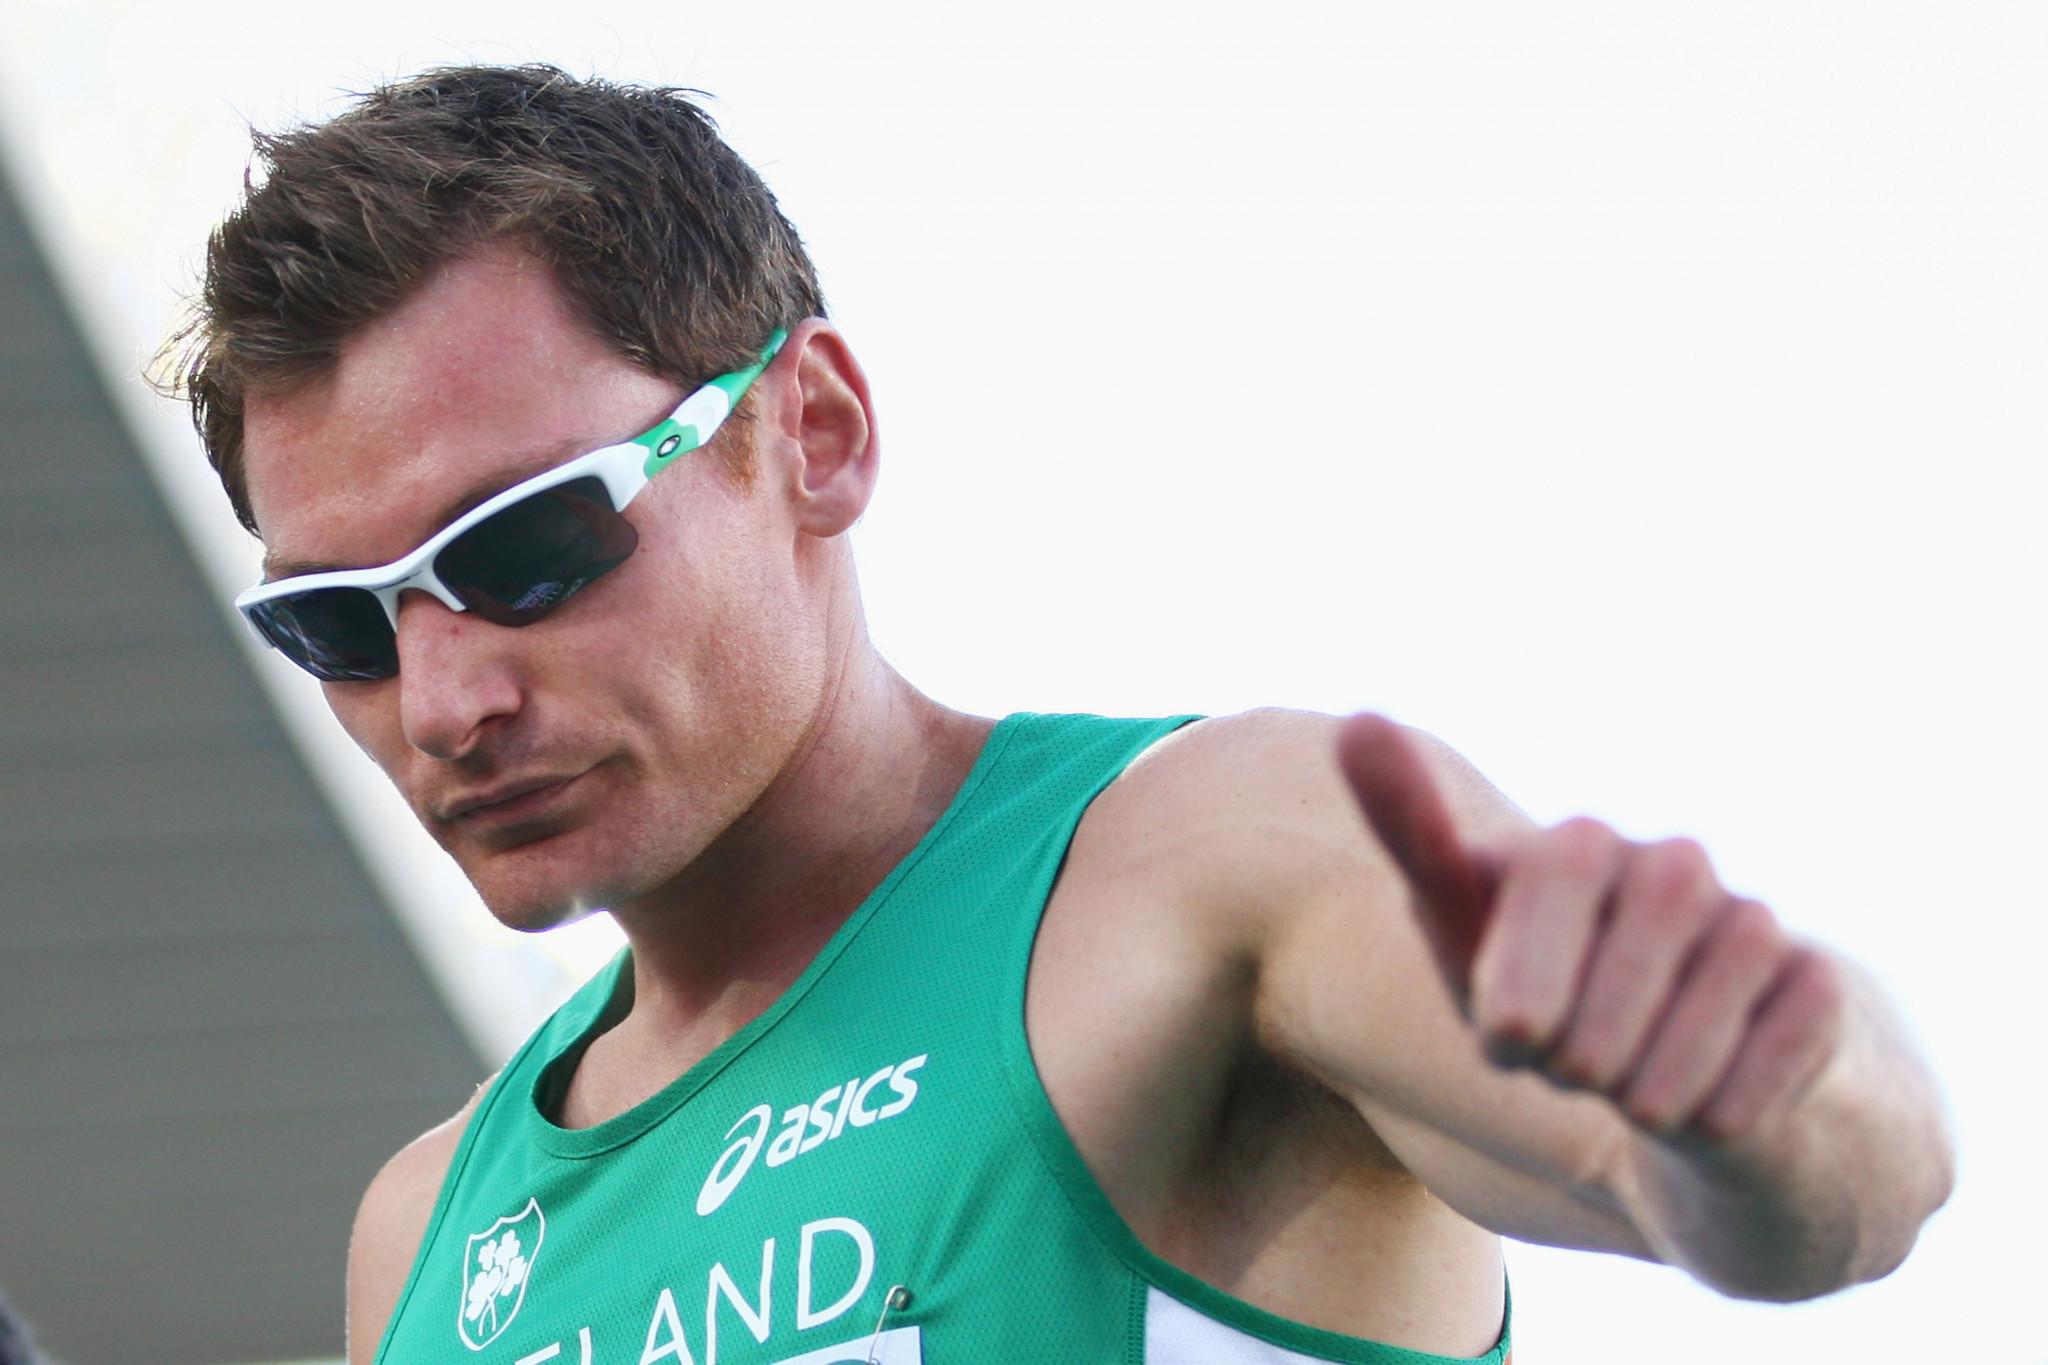 Student Sport Ireland launches webinar series on high performance